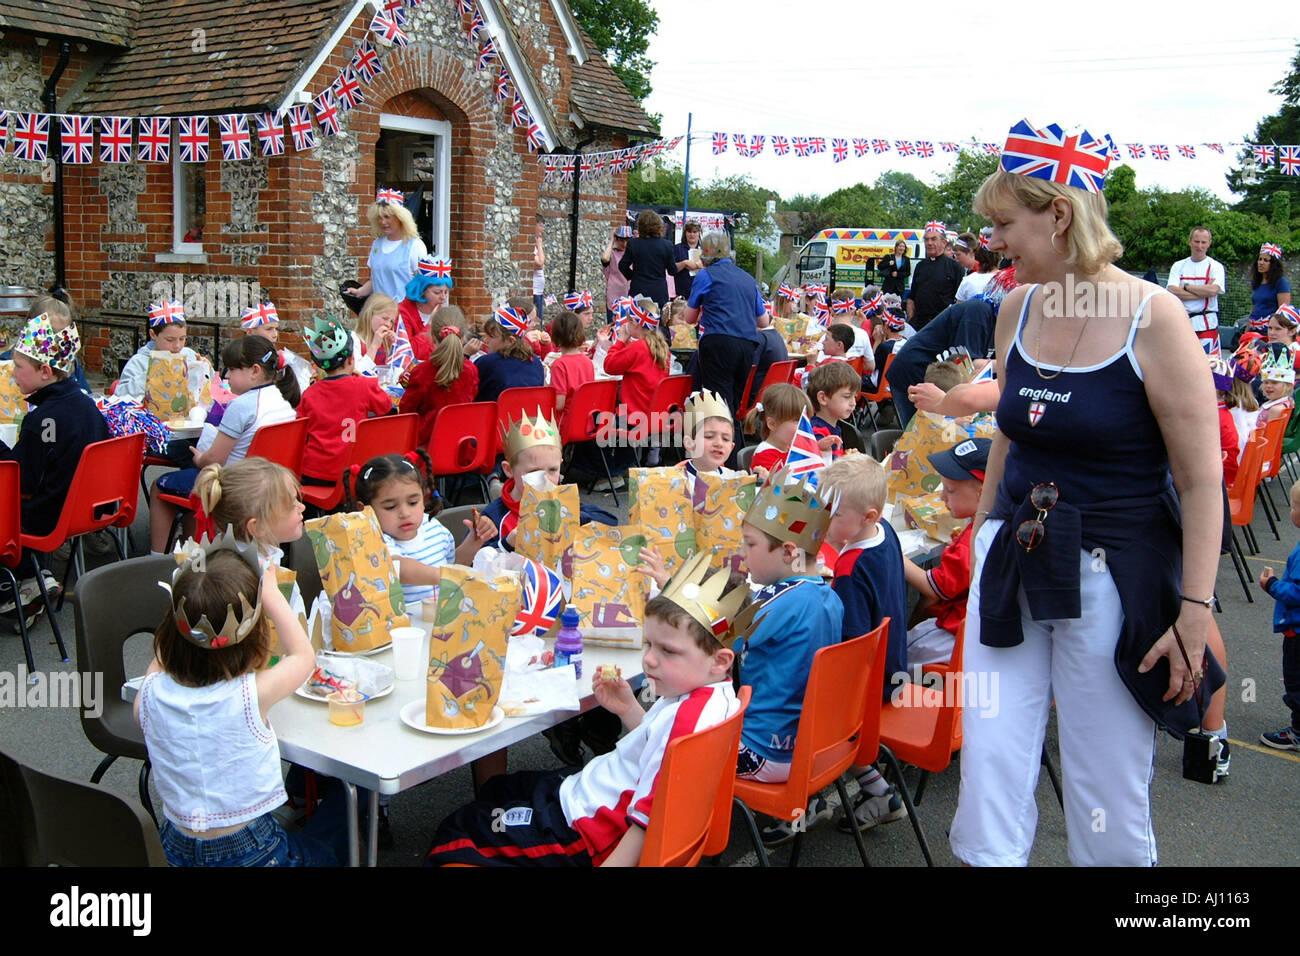 HM Queen Elizabeth's Golden Jubilee Celebrations at a Hampshire school England - Stock Image